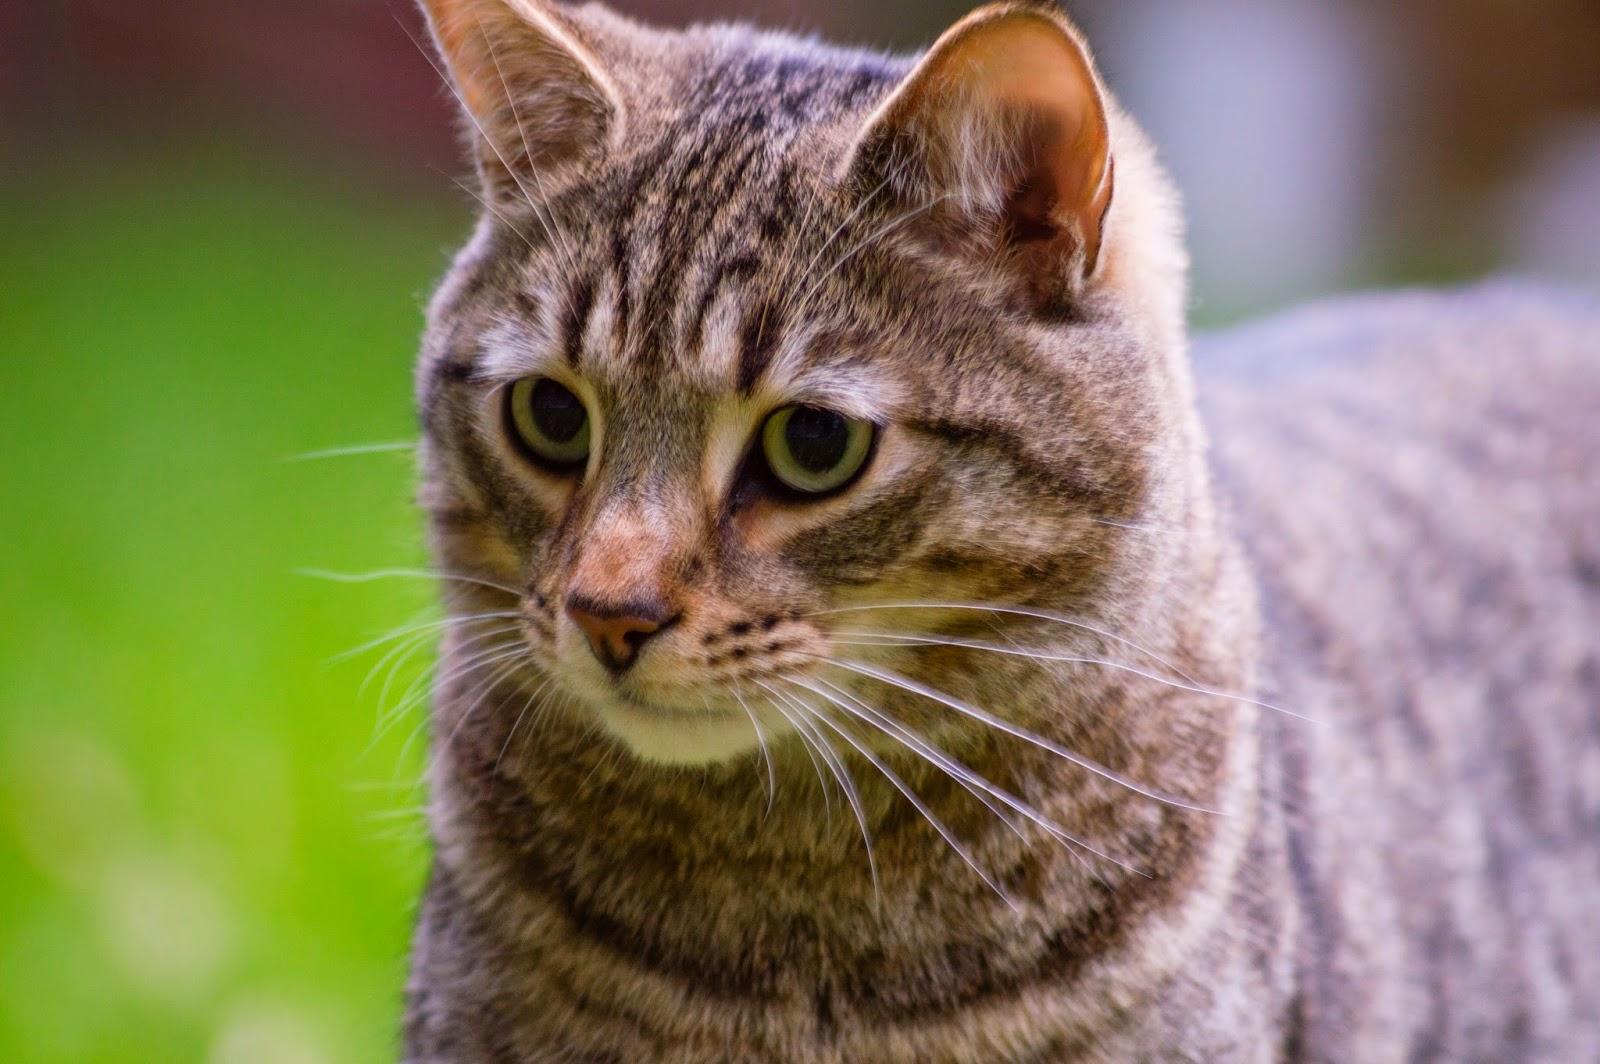 Nikon-D3200-Image-example-cat